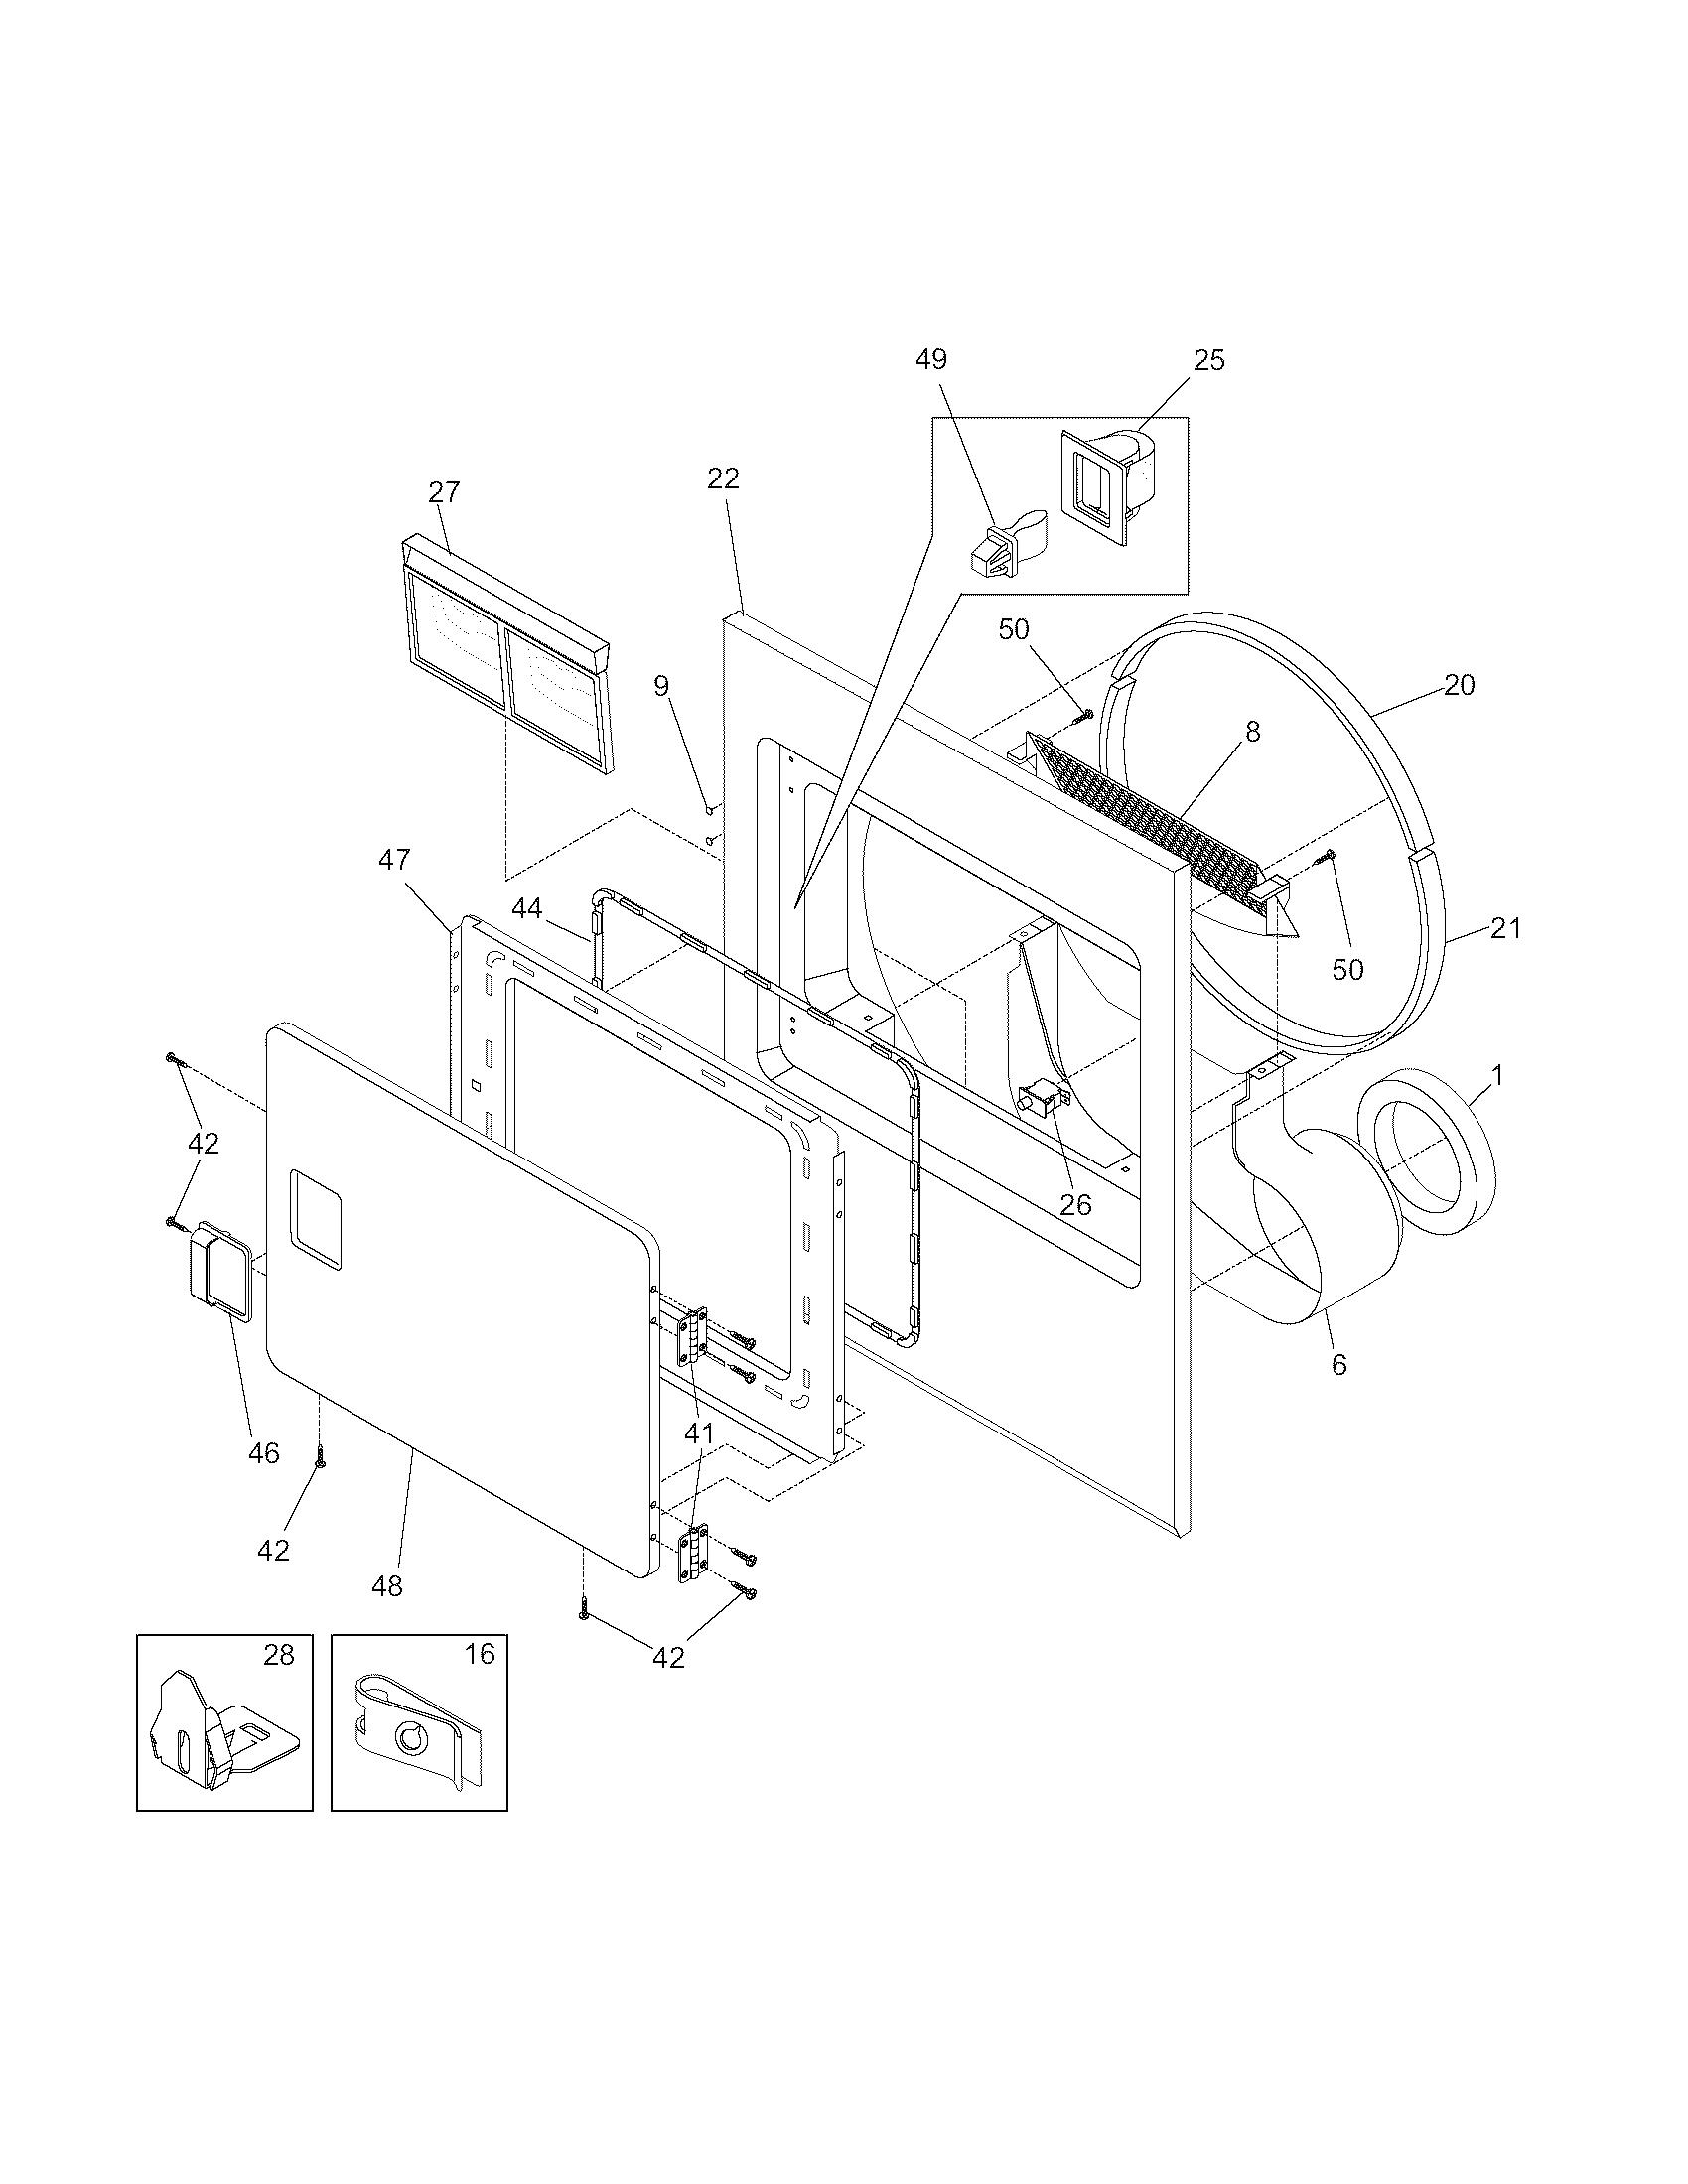 wiring diagram for crosley dryer fy 8544  crosley parts diagrams also with crosley washing machine  crosley washing machine